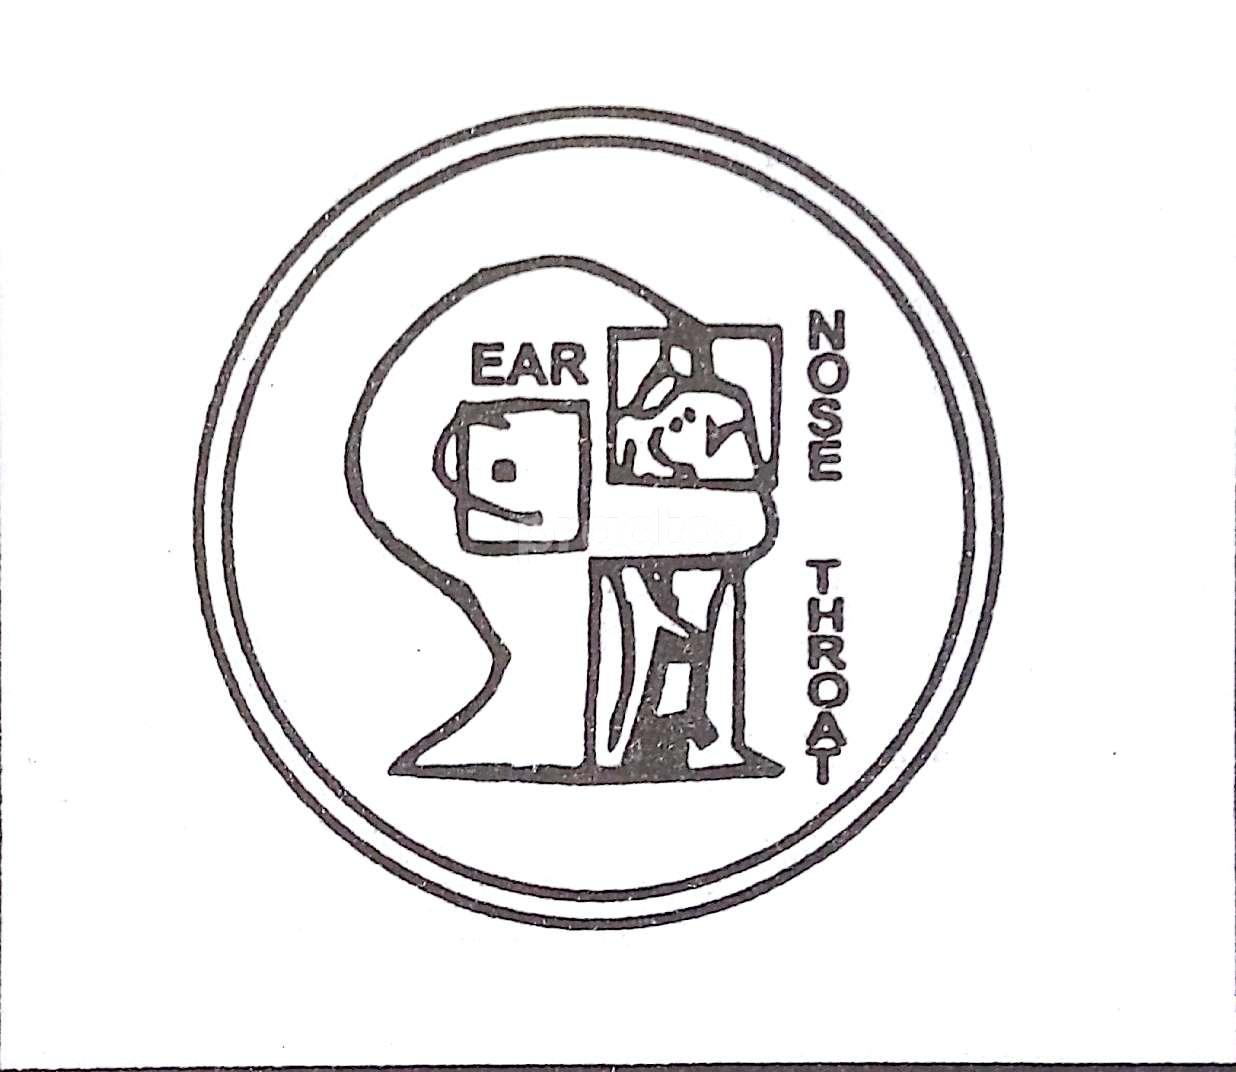 Dr. A. Dwivedi S Ear Nose Throat Clinic